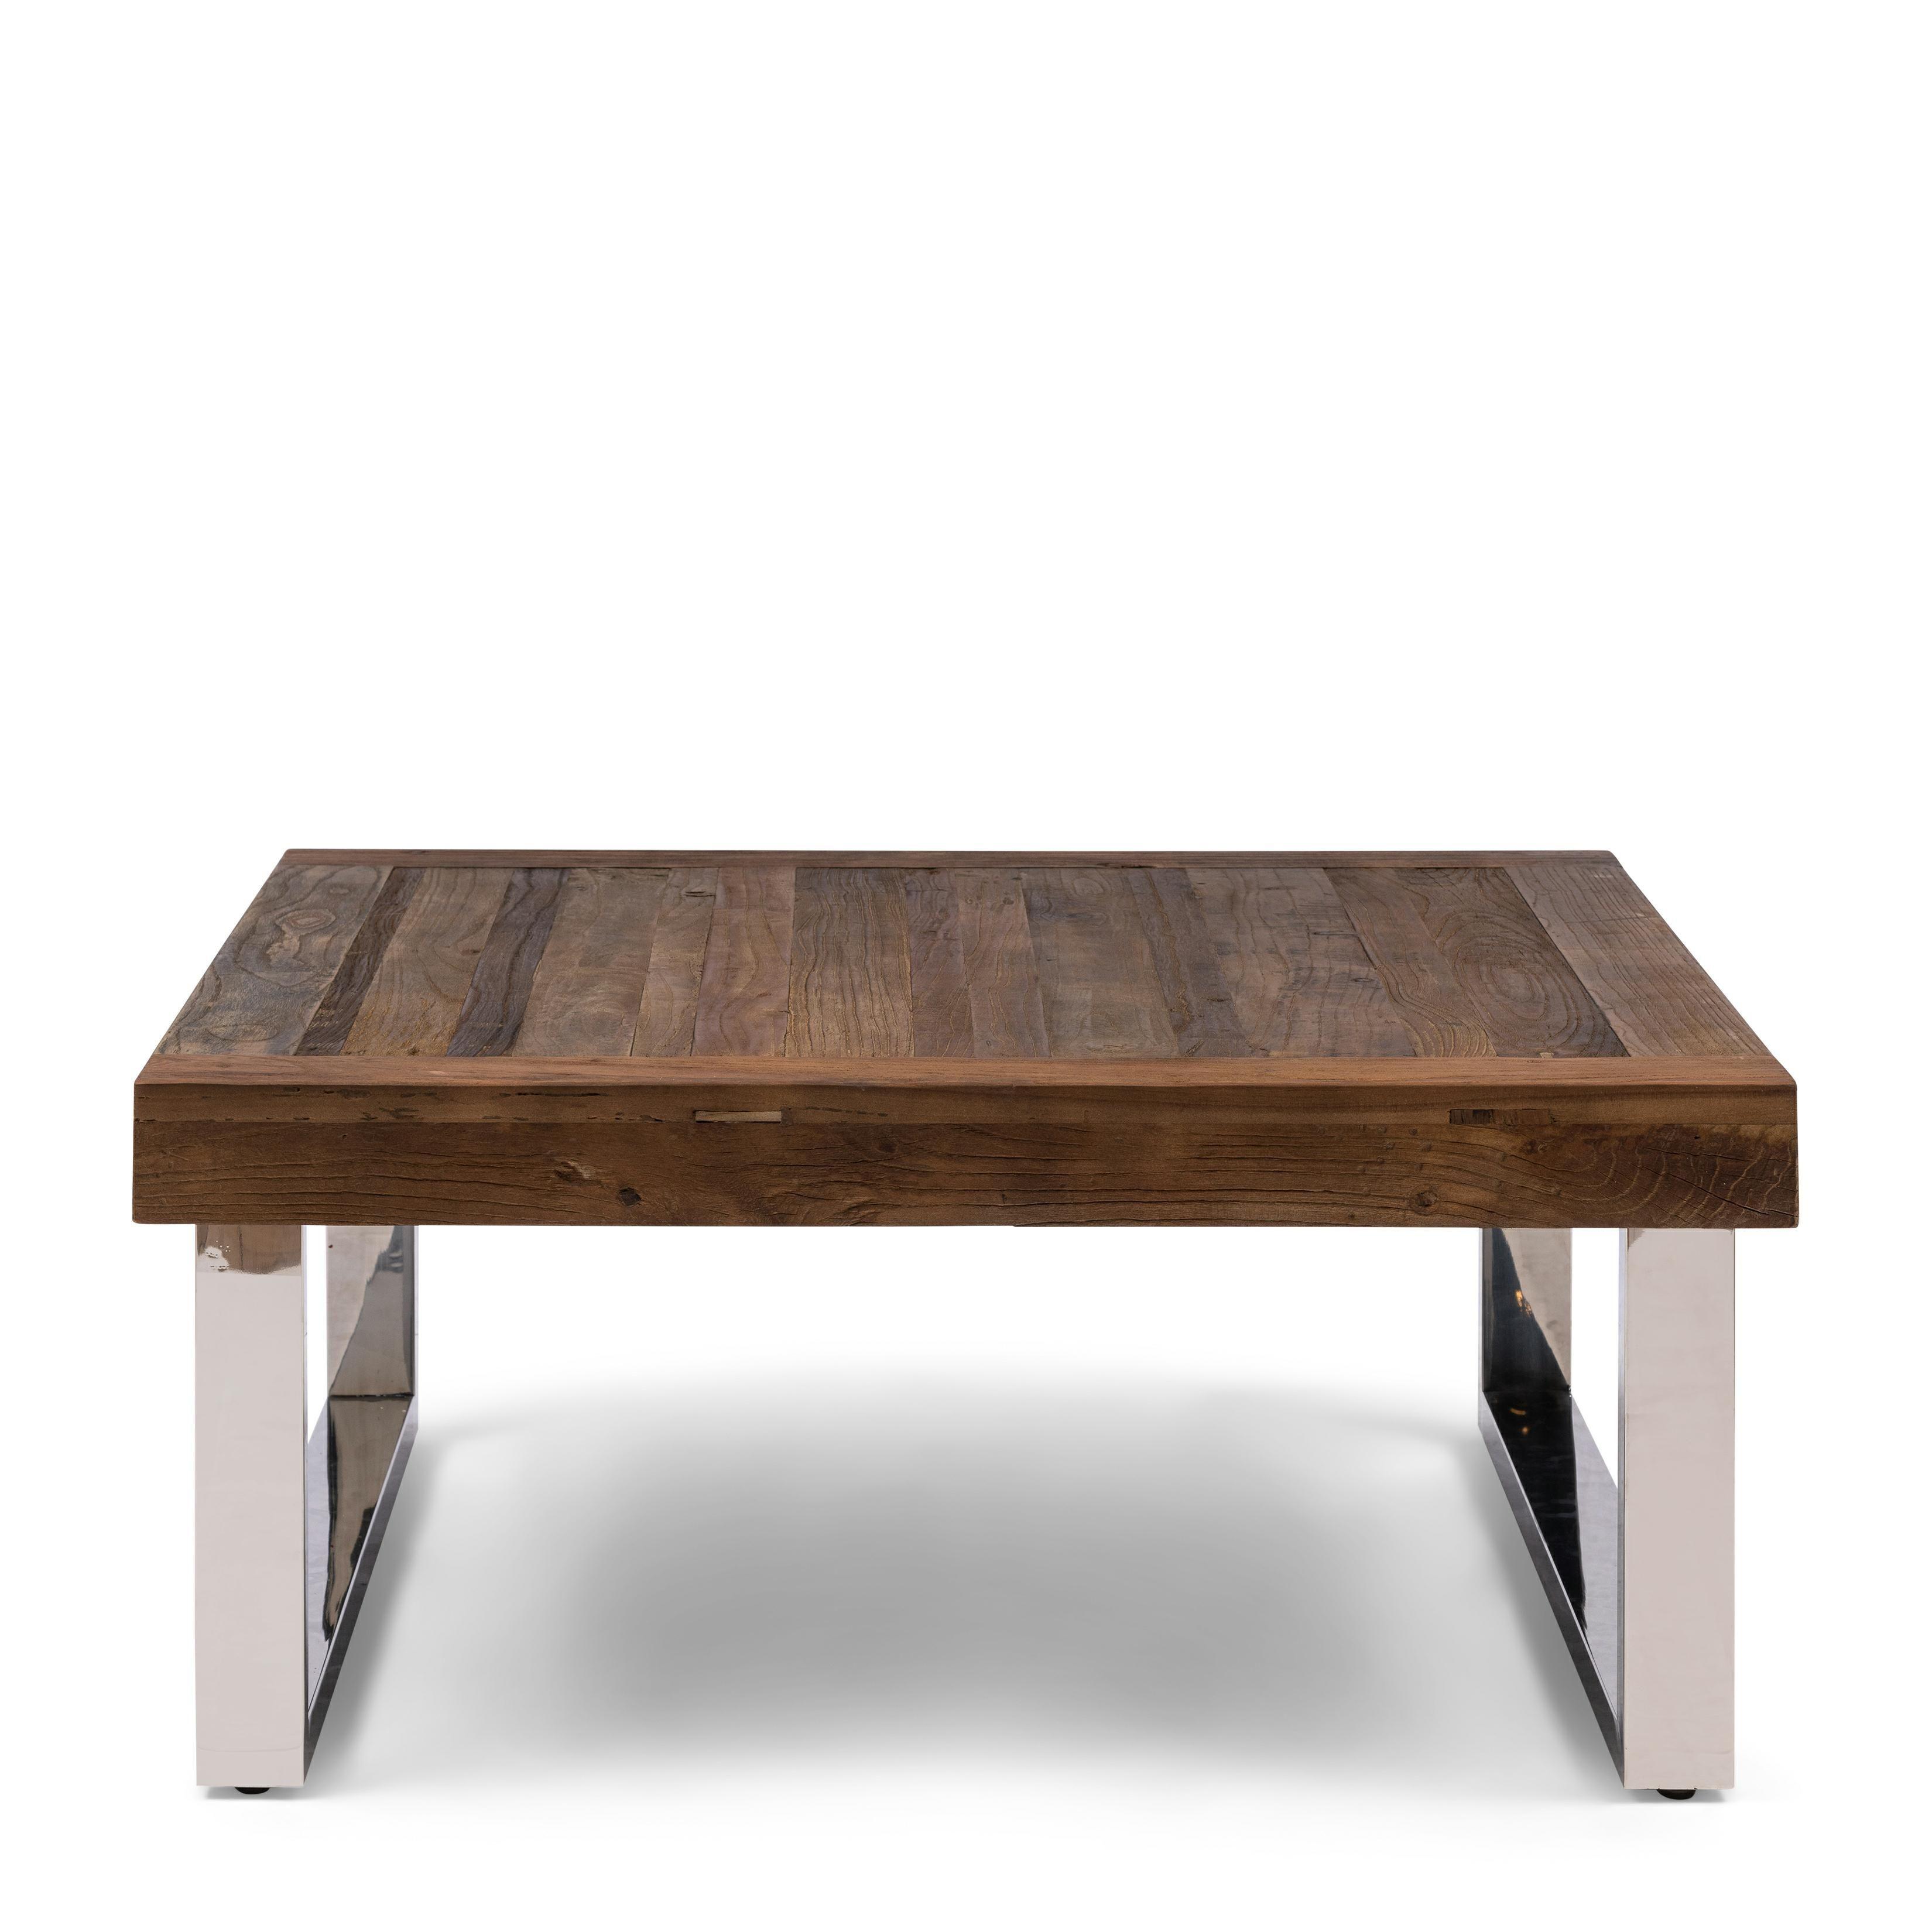 Washington Coffee Table 90x90 / Rivièra Maison